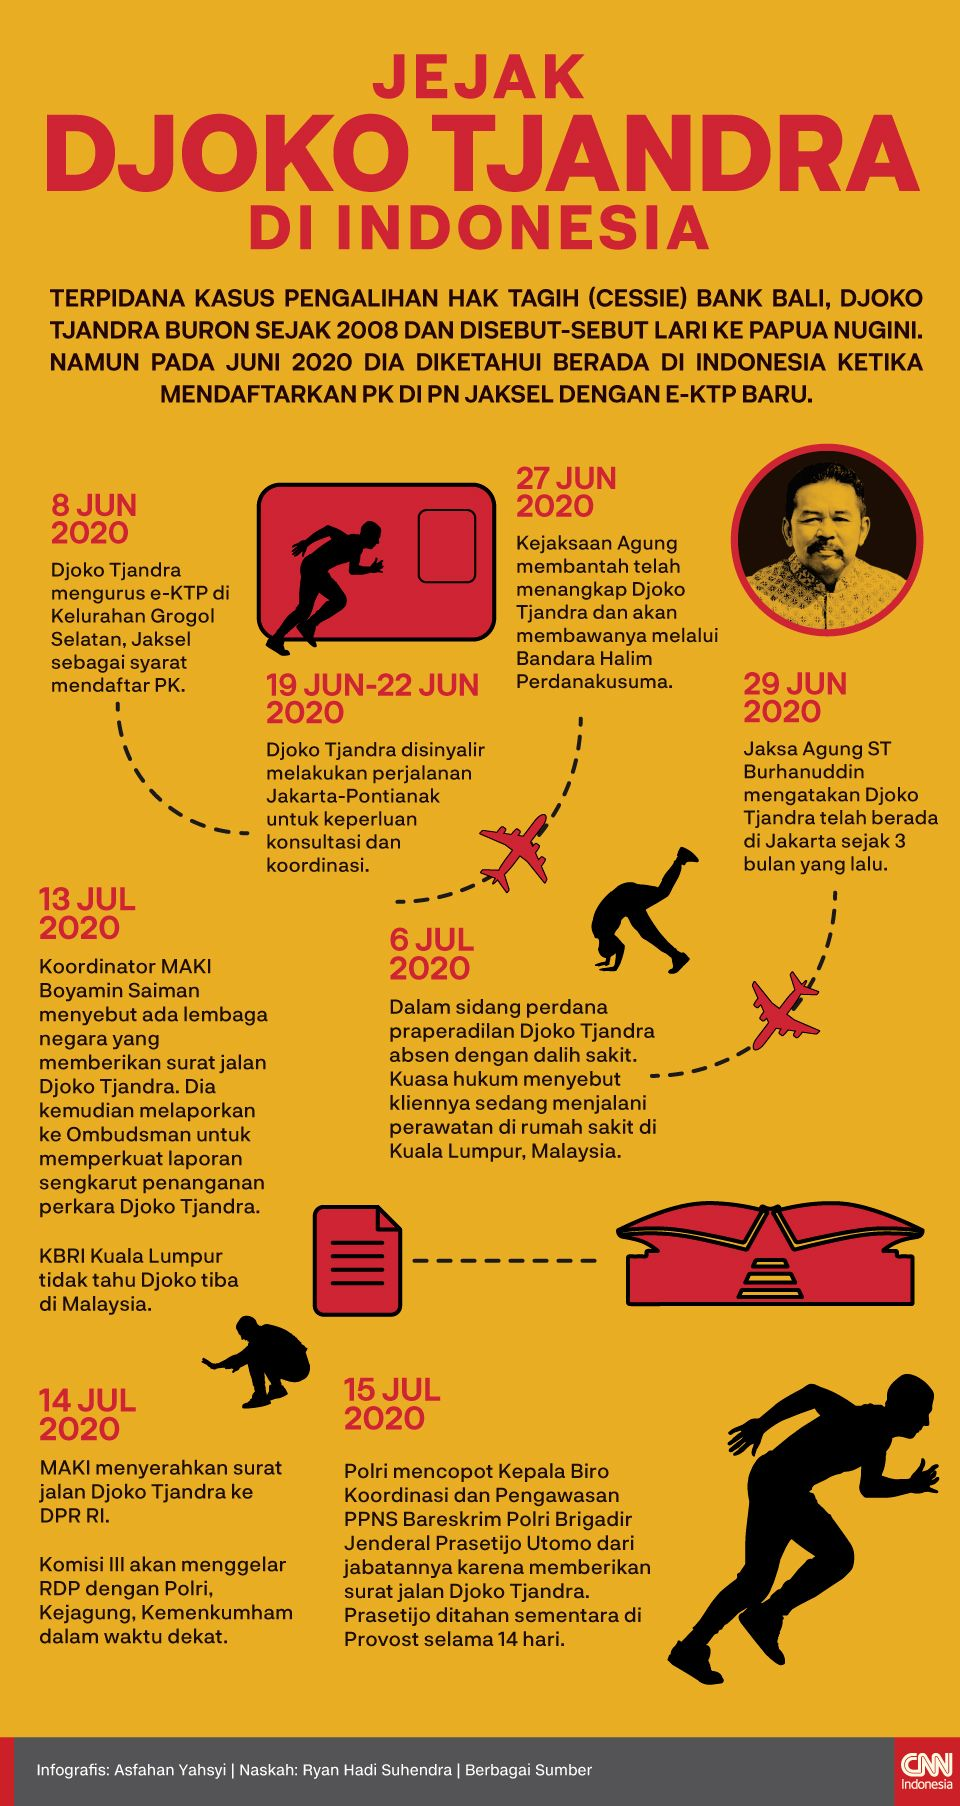 Infografis Jejak Djoko Tjandra di Indonesia